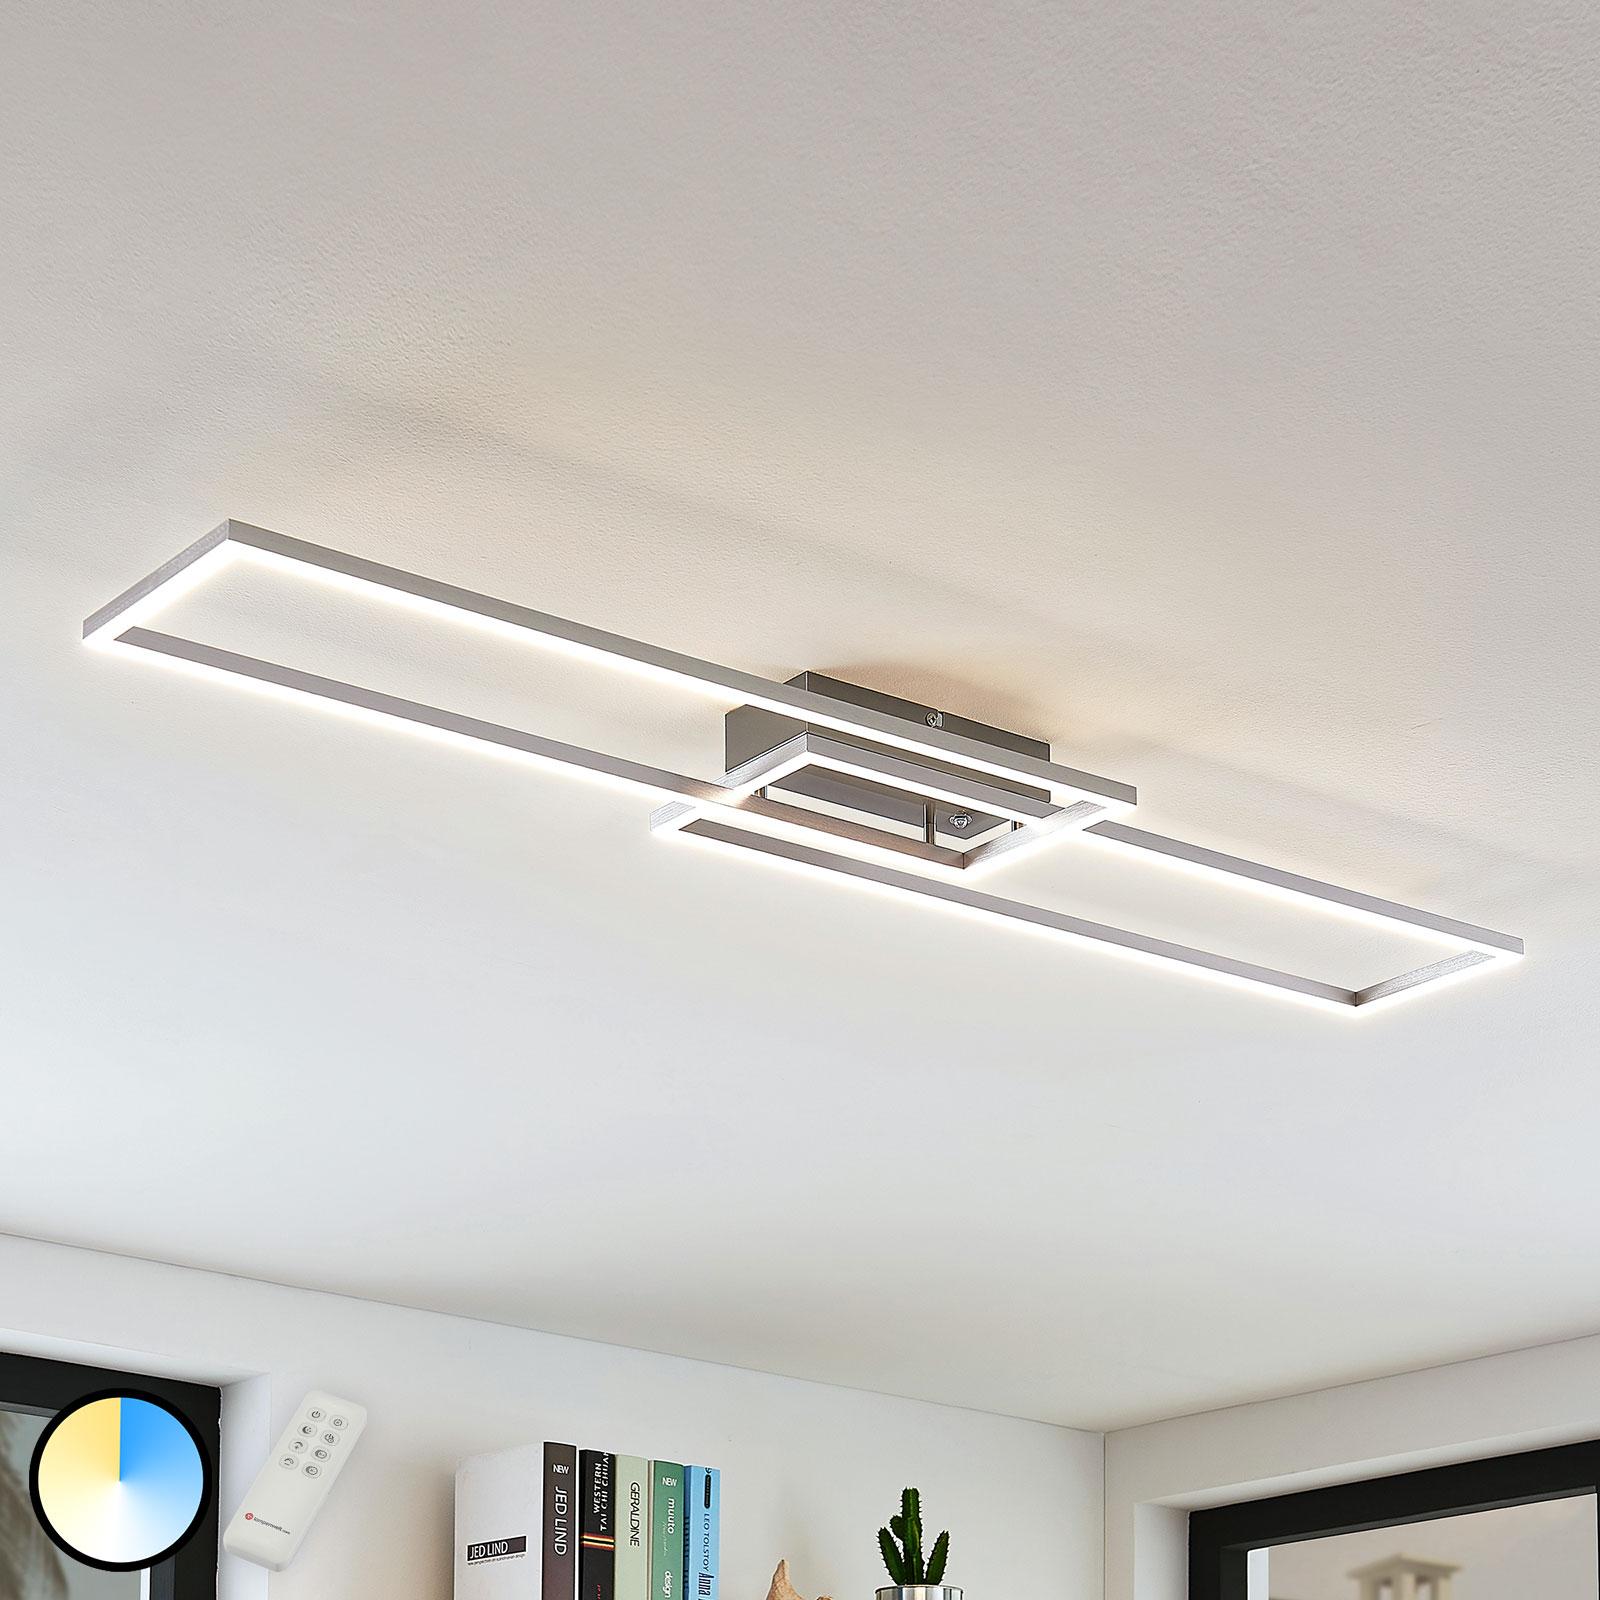 Lampa sufitowa LED Quadra, 2-punktowa, 110 cm